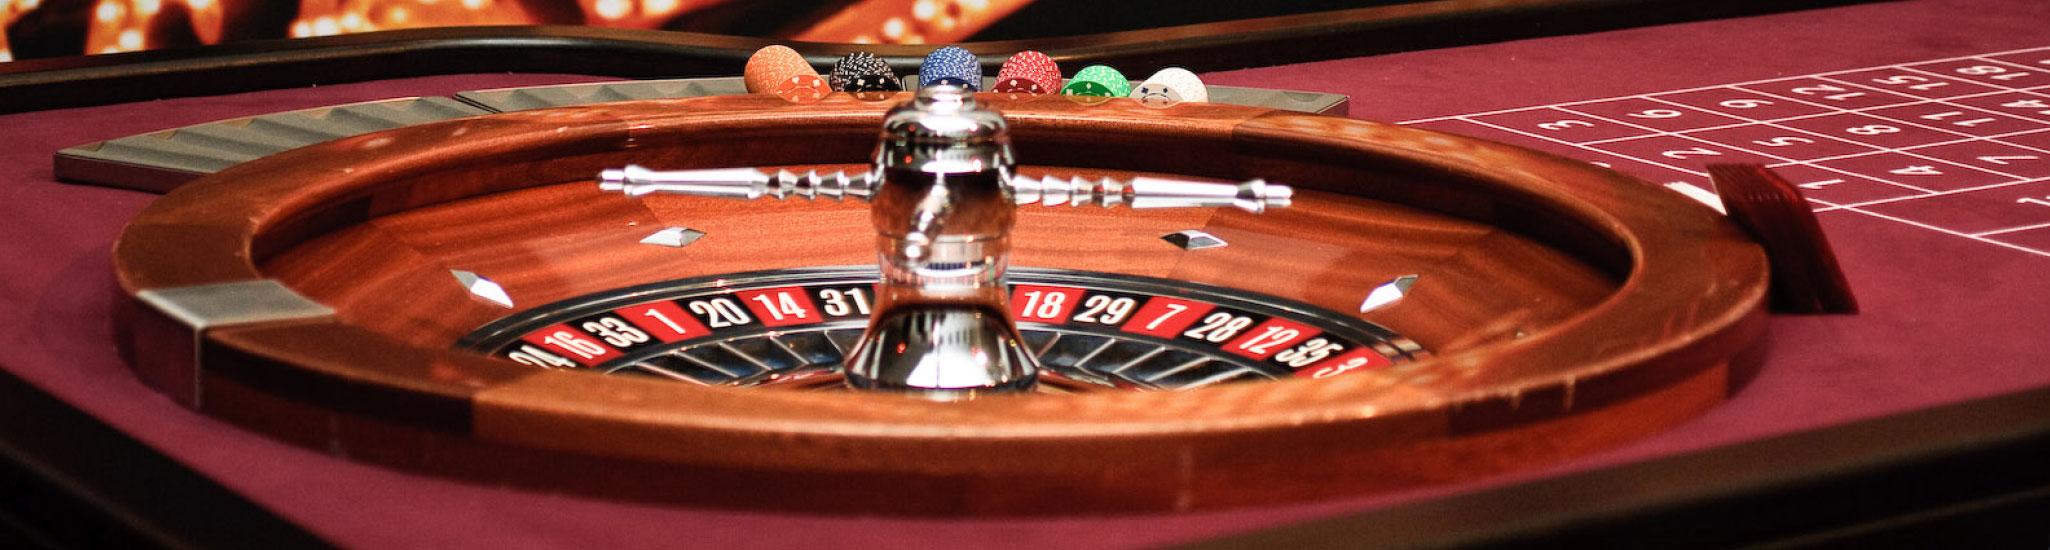 Best us online casino no deposit bonus